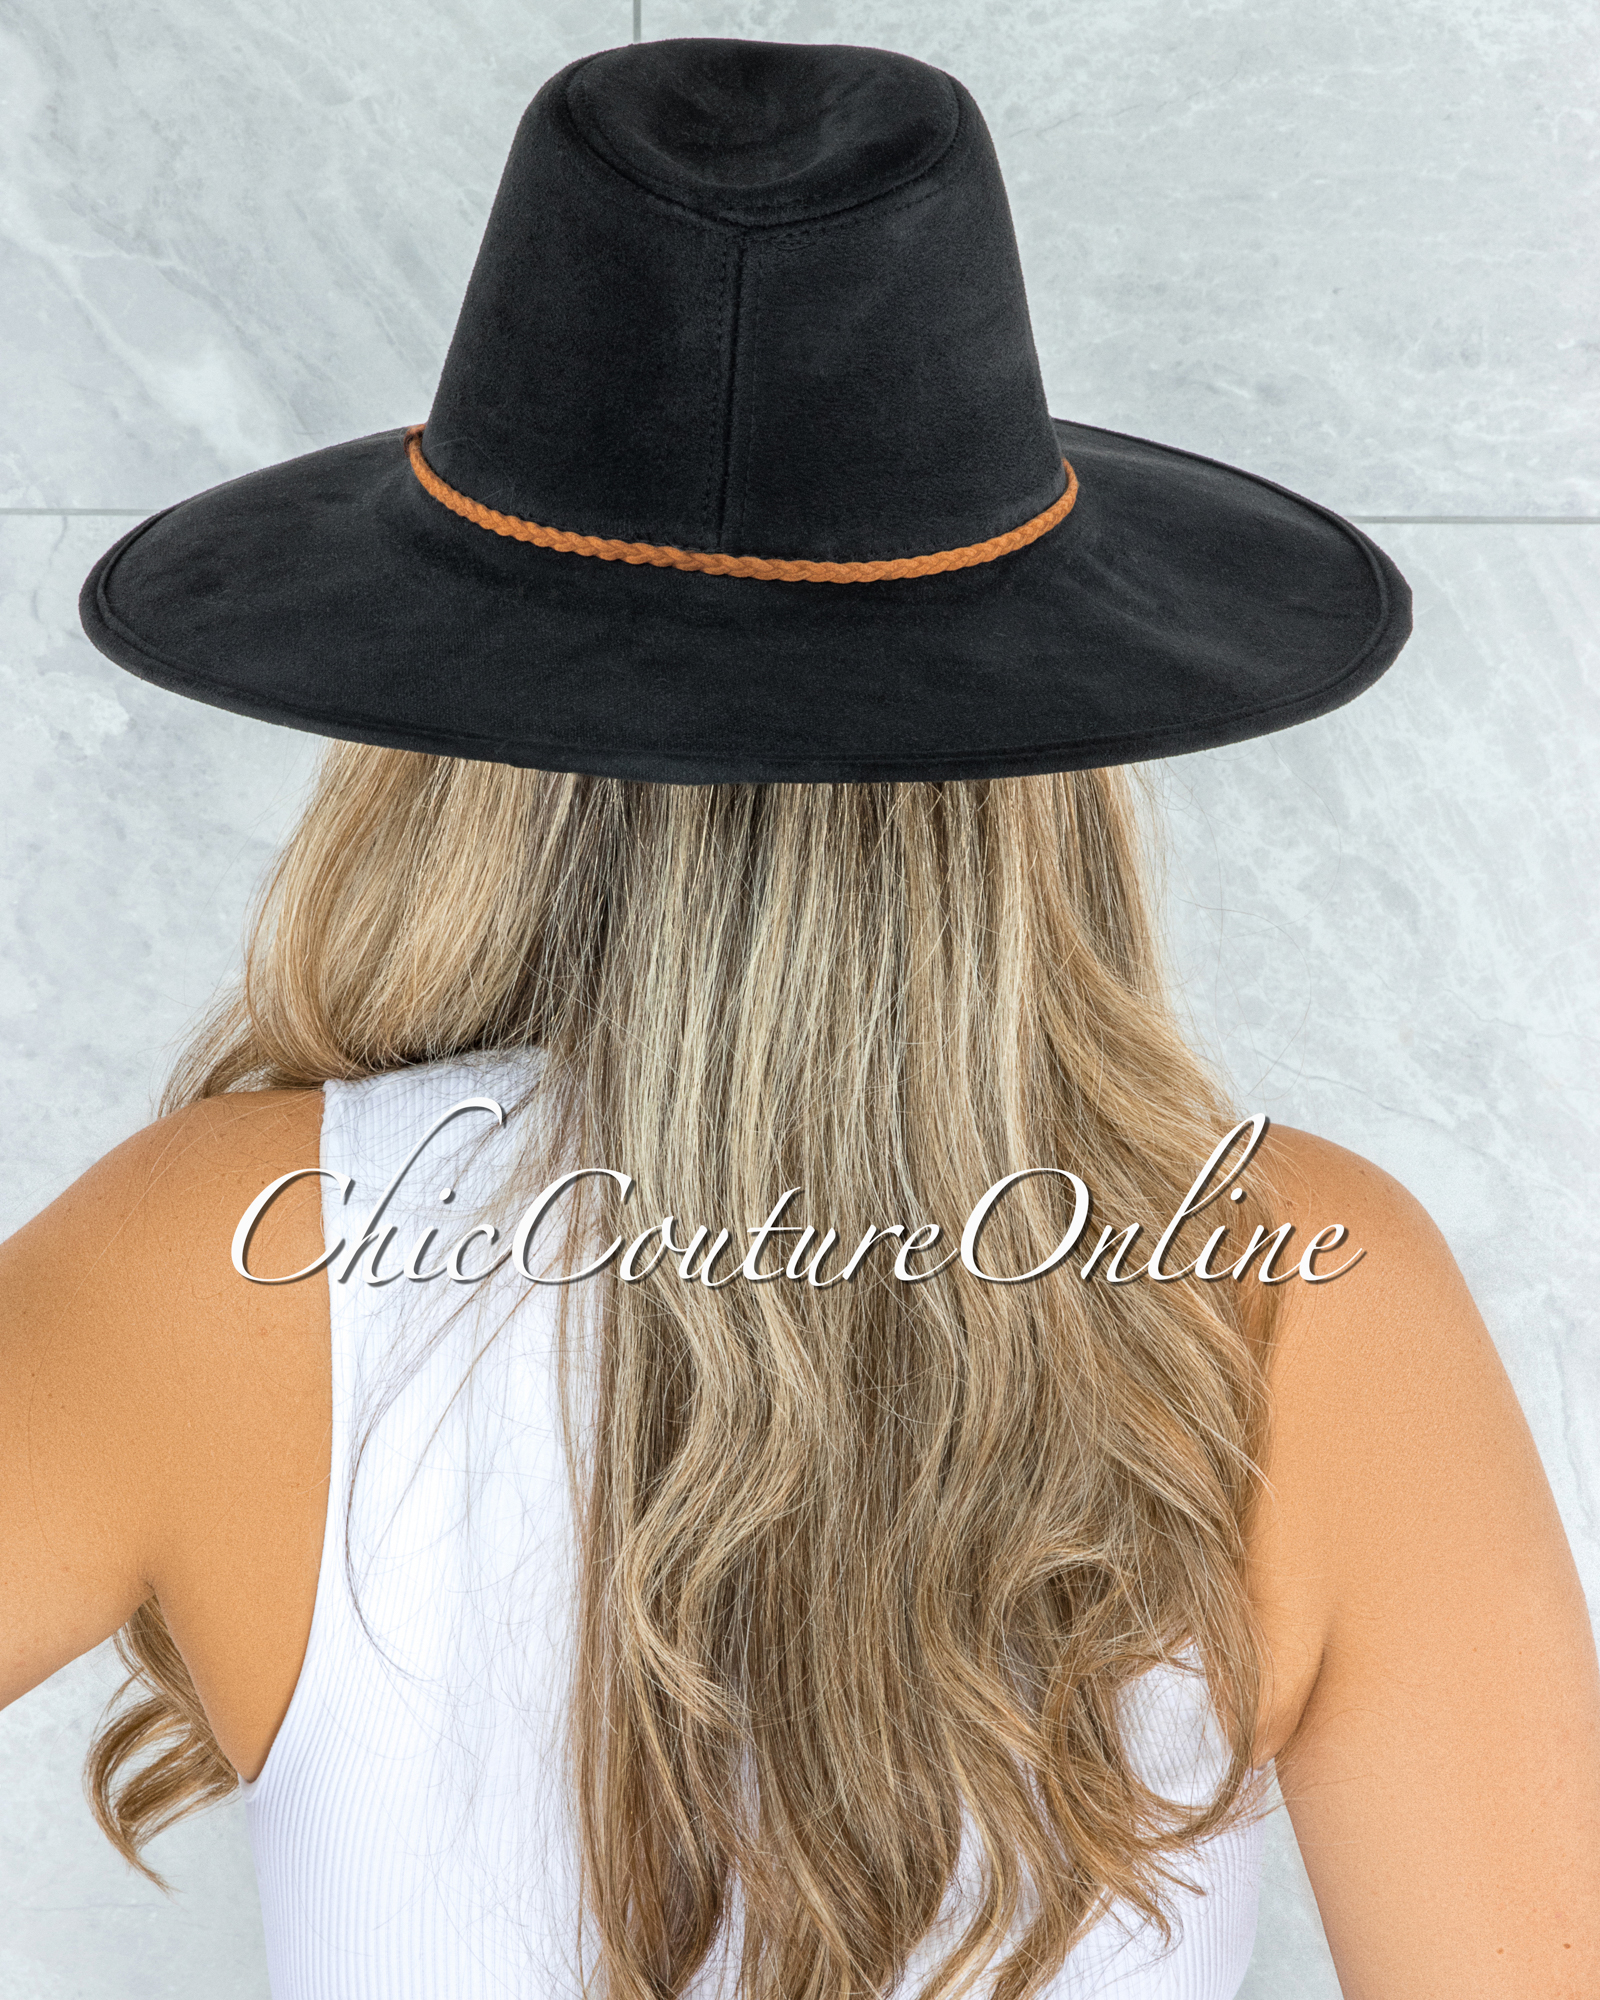 Gipsy Black Brown Braid Faux Suede Bush Hat